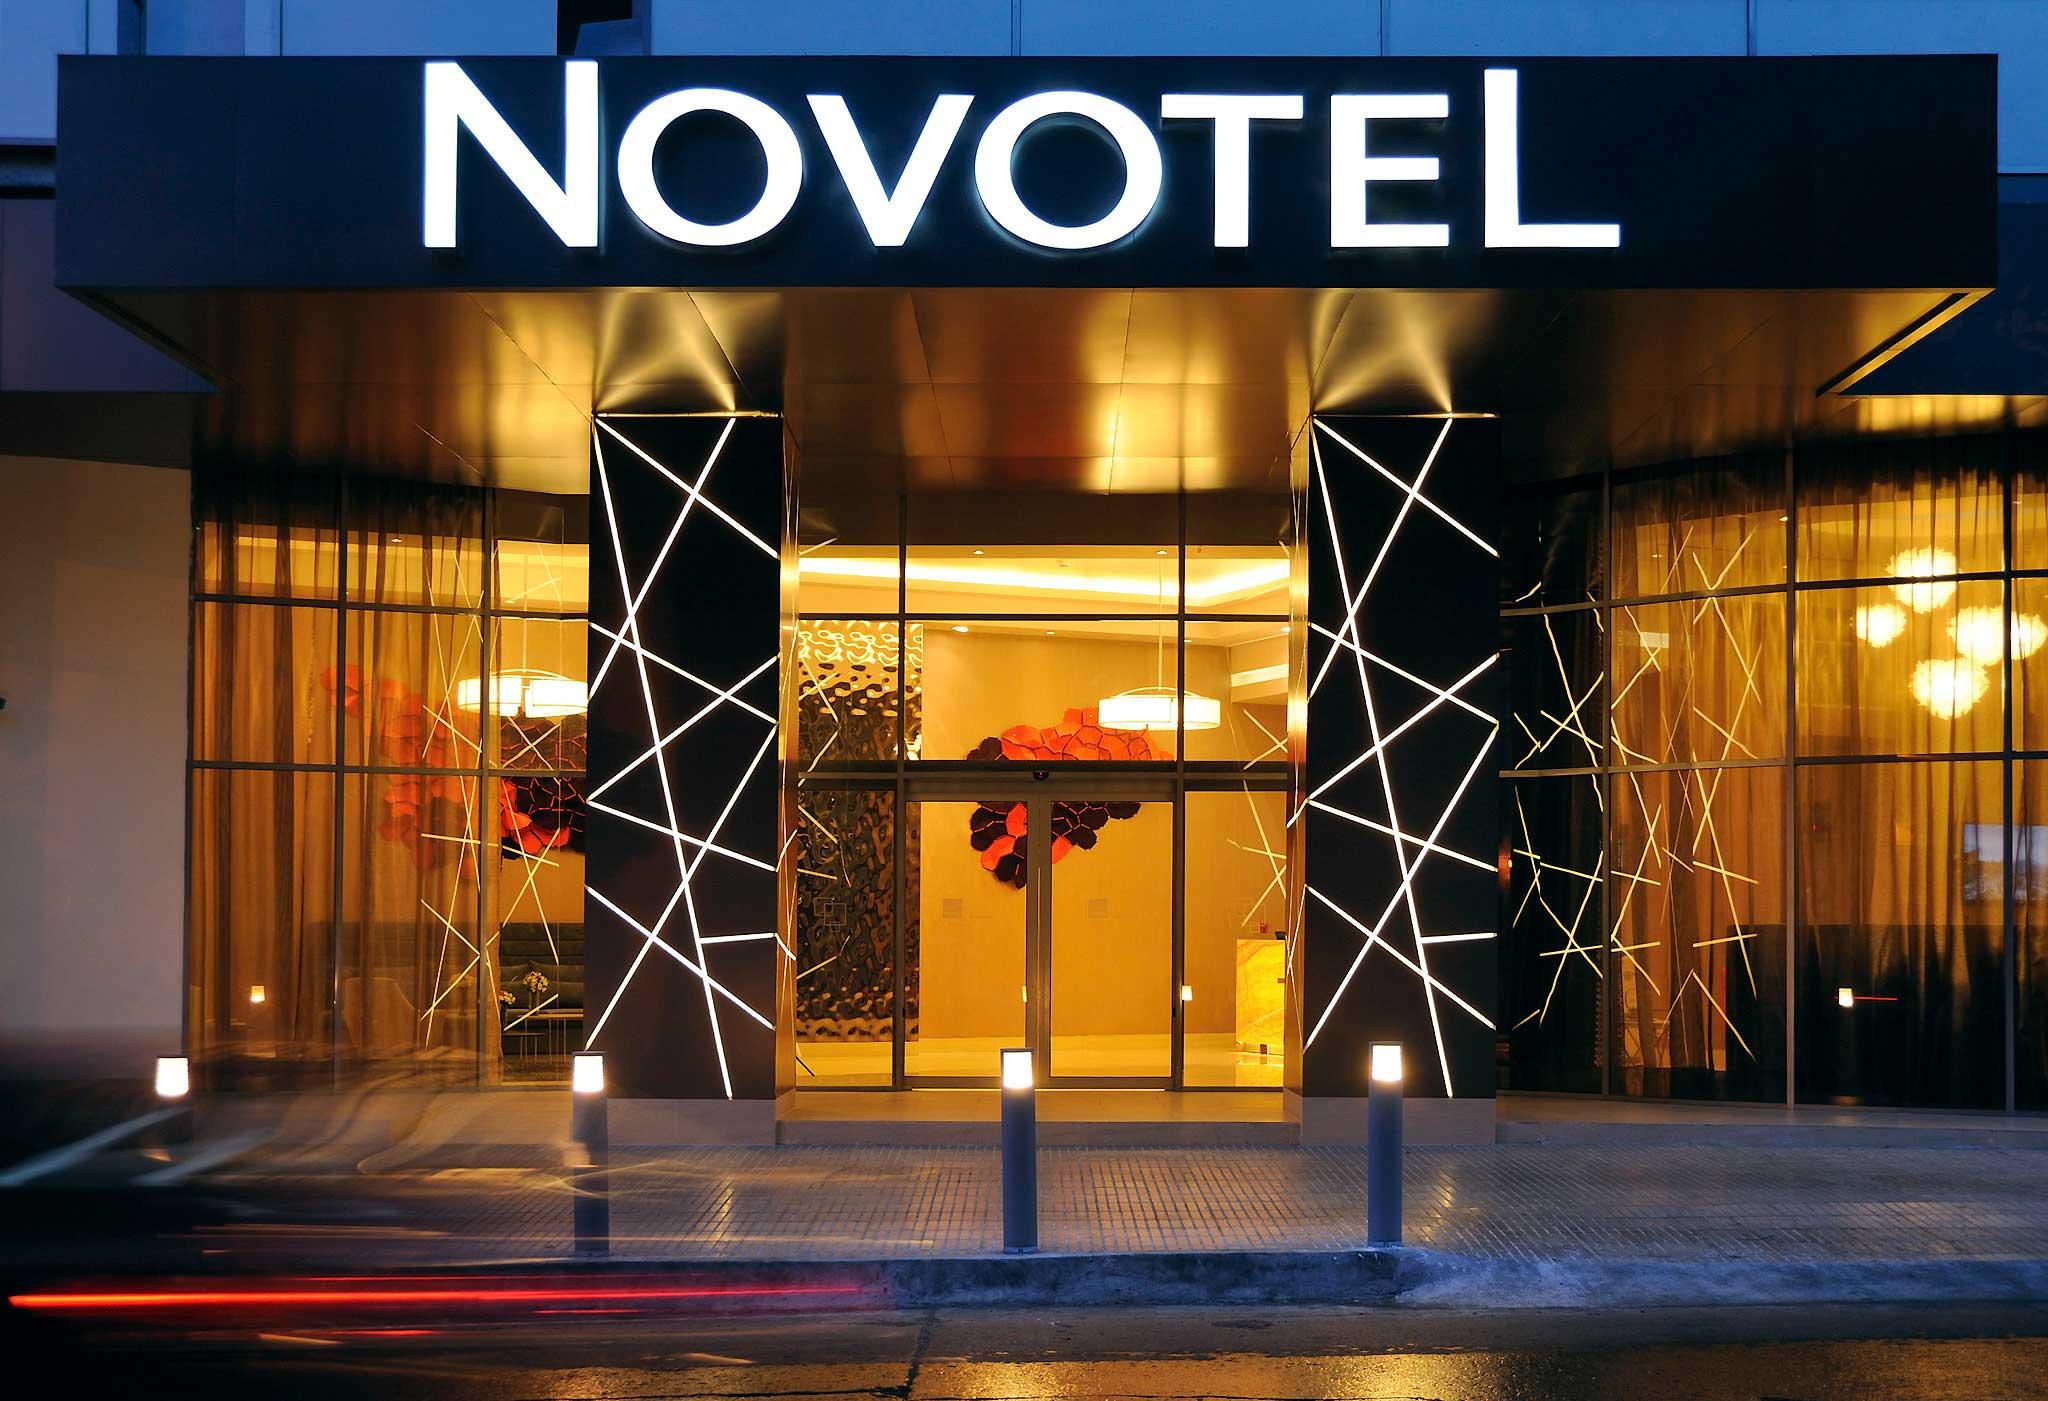 Exterior view of Novotel Toronto North York.